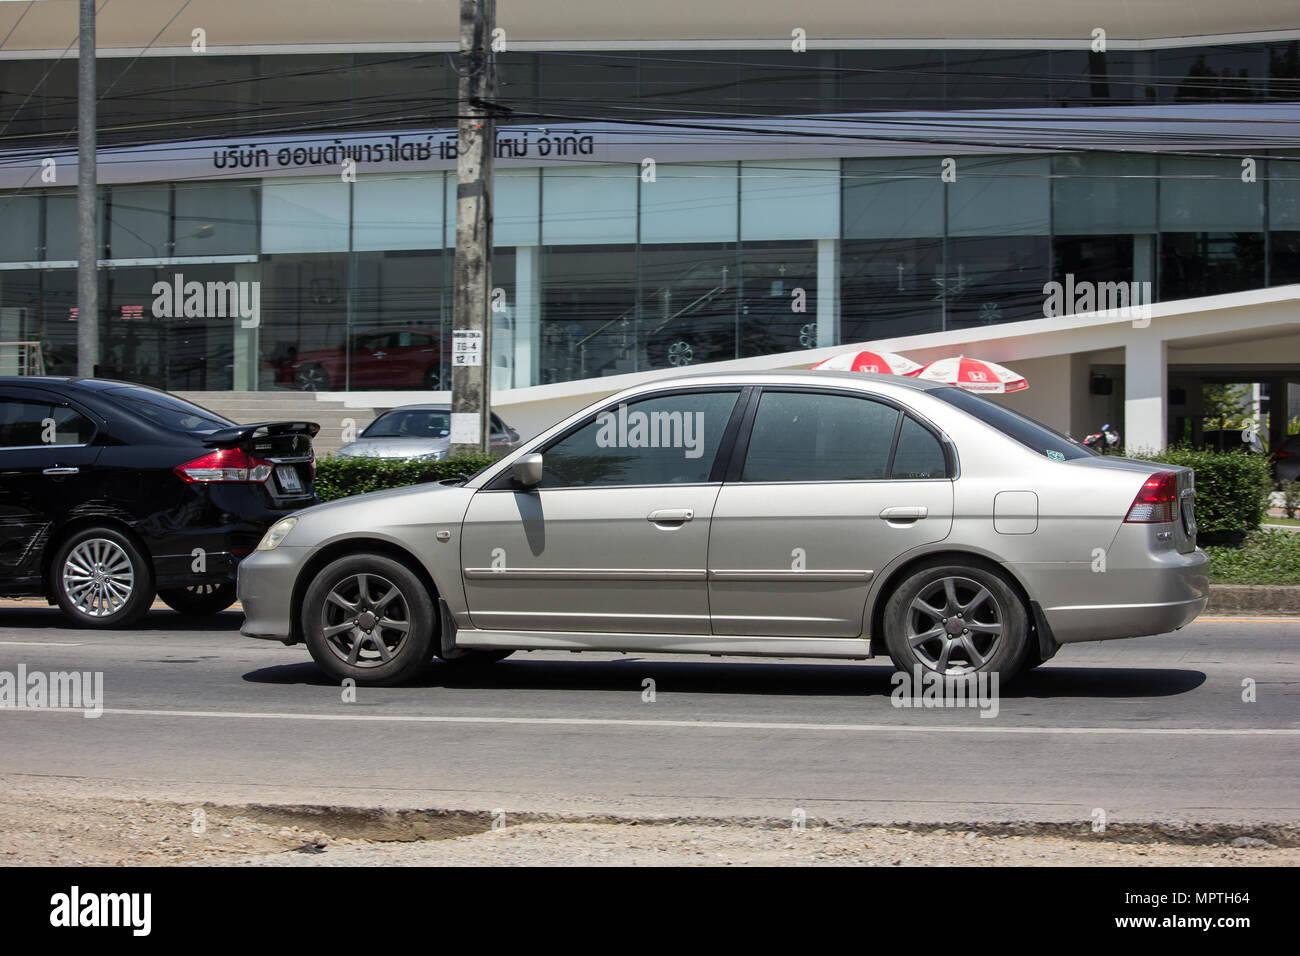 Chiang Mai Thailand May 18 2018 Private Sedan Car From Honda